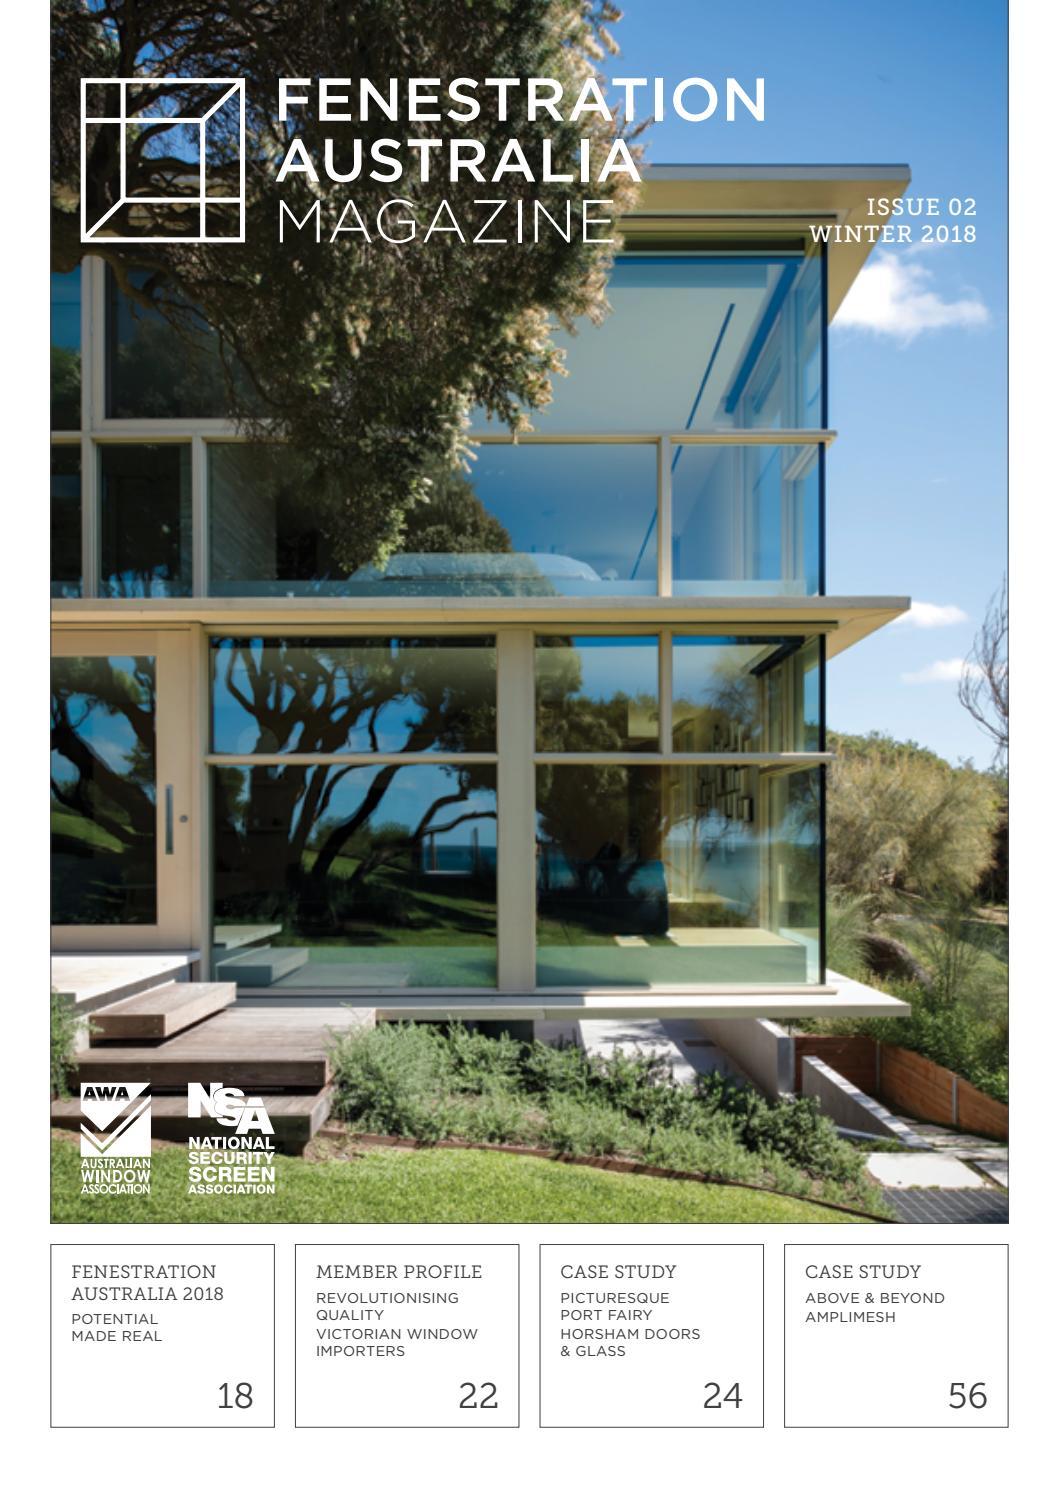 Fenestration Australia Magazine Issue 02 Winter 2018 by